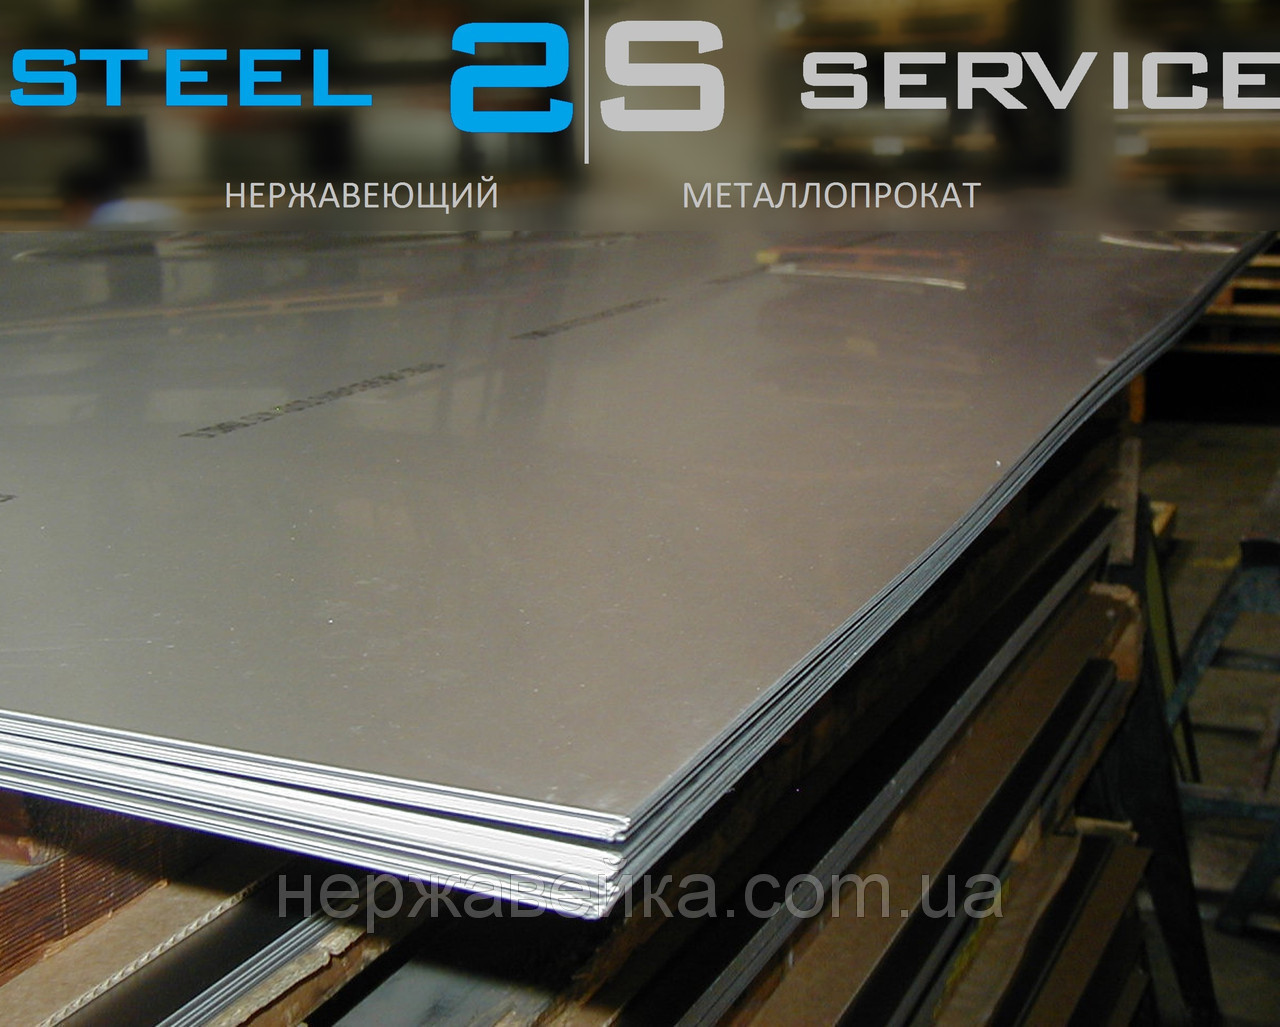 Листовая нержавейка 1,5х1500х3000мм AISI 430(12Х17) 2B - матовый, технический